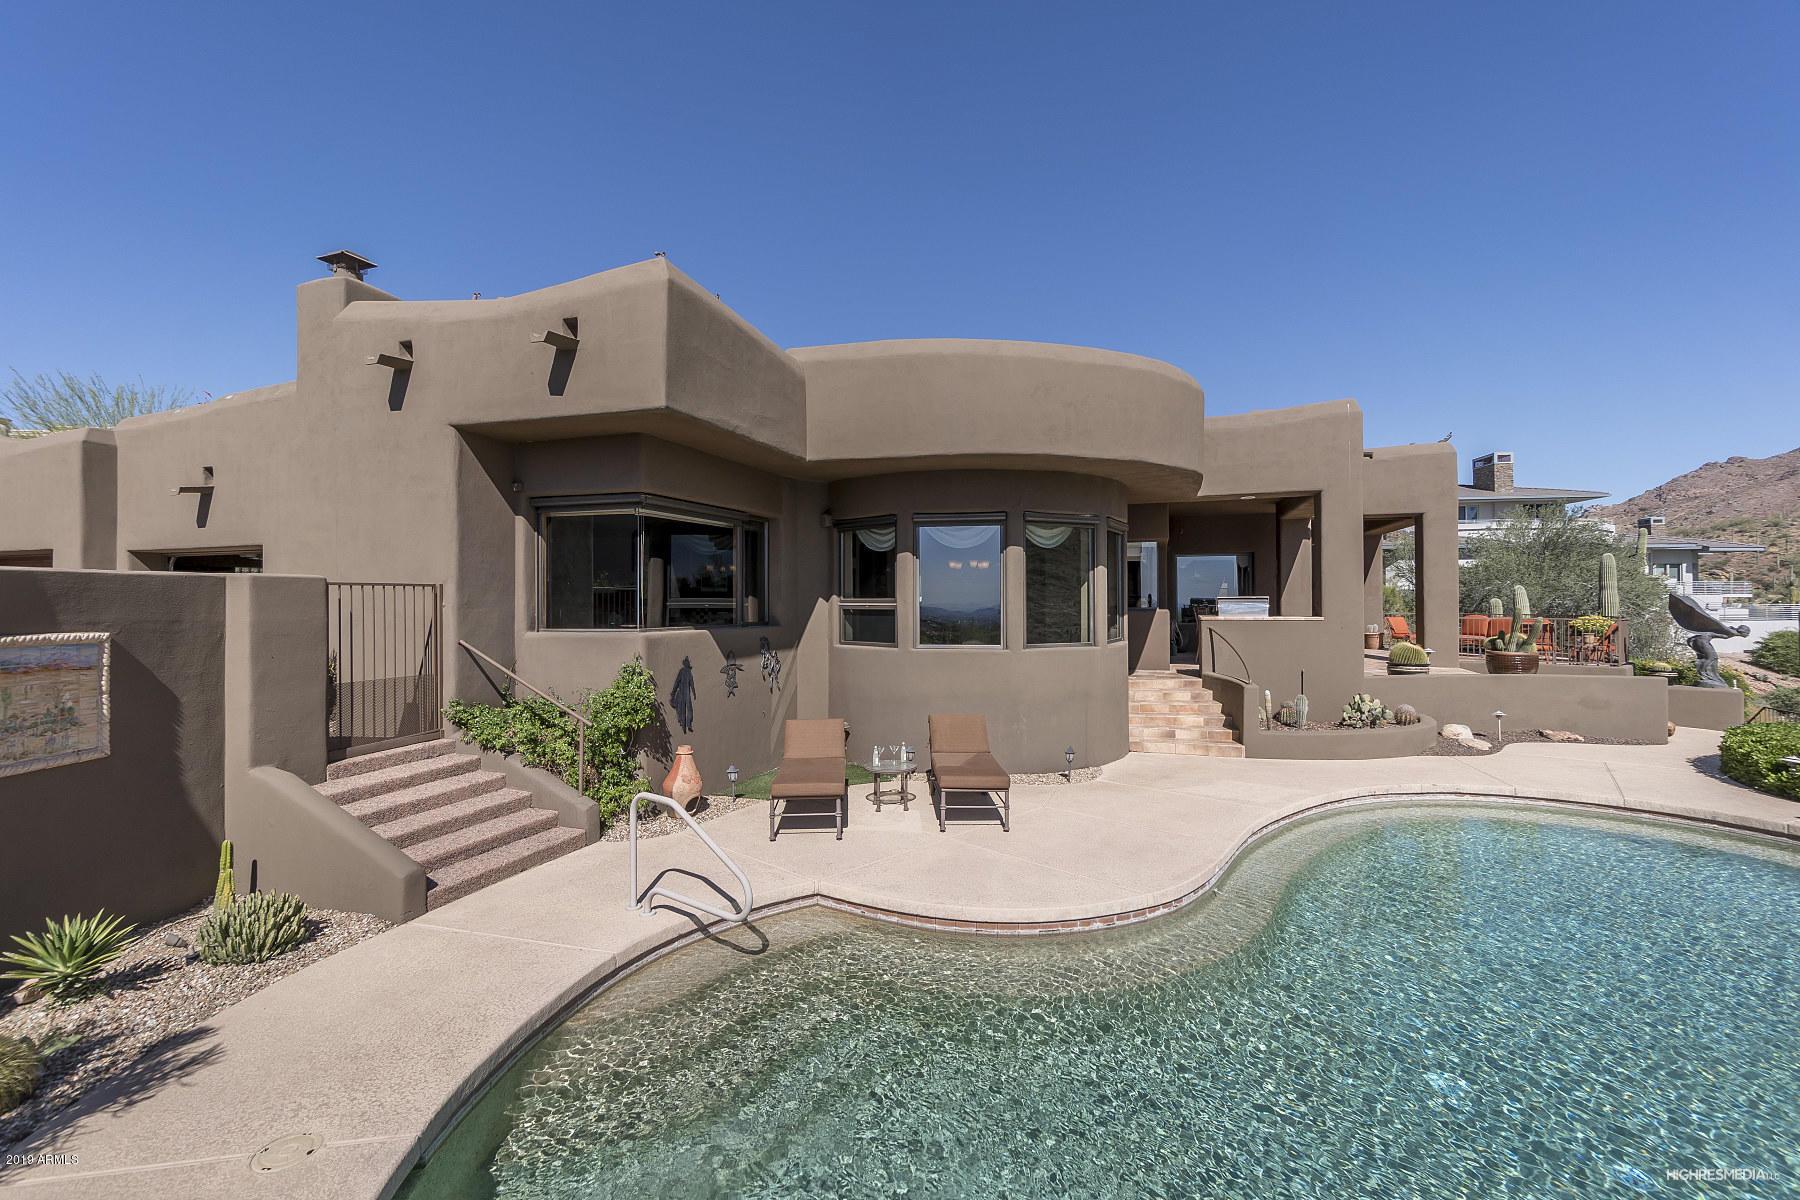 MLS 5916335 10801 E HAPPY VALLEY Road Unit 121, Scottsdale, AZ 85255 Scottsdale AZ Private Pool